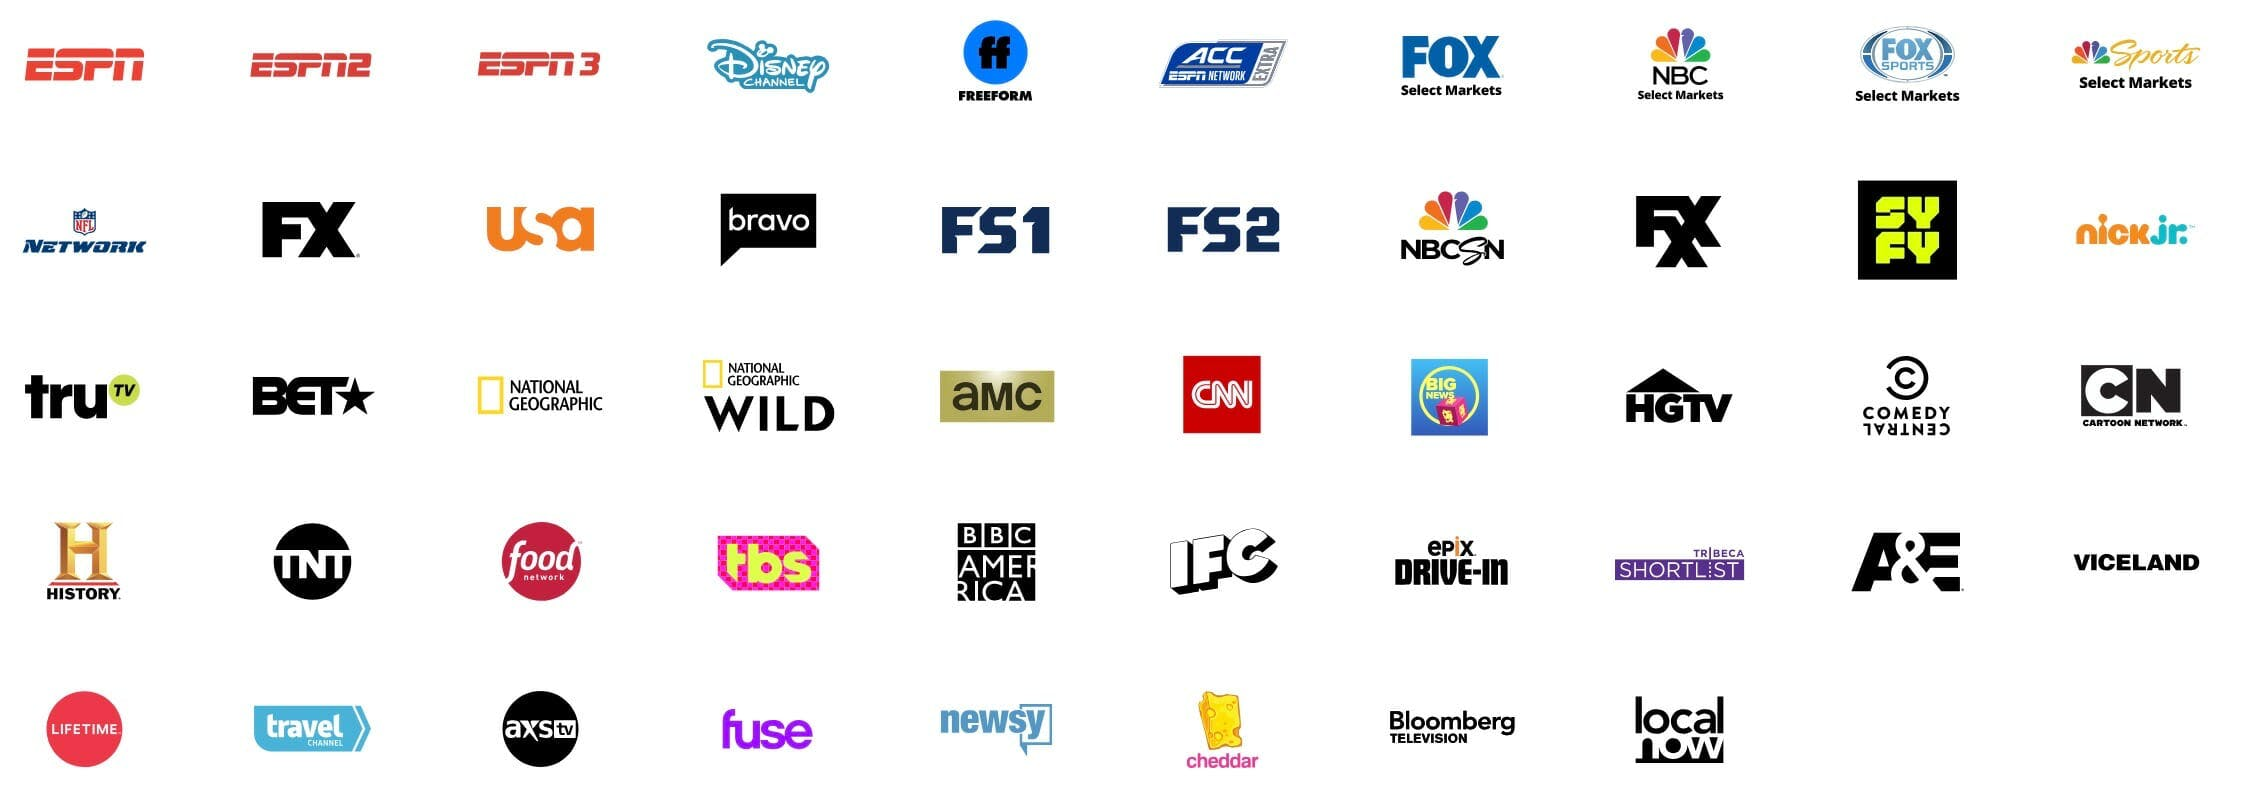 stream nfl games today on tv week 15 - sling orange + blue